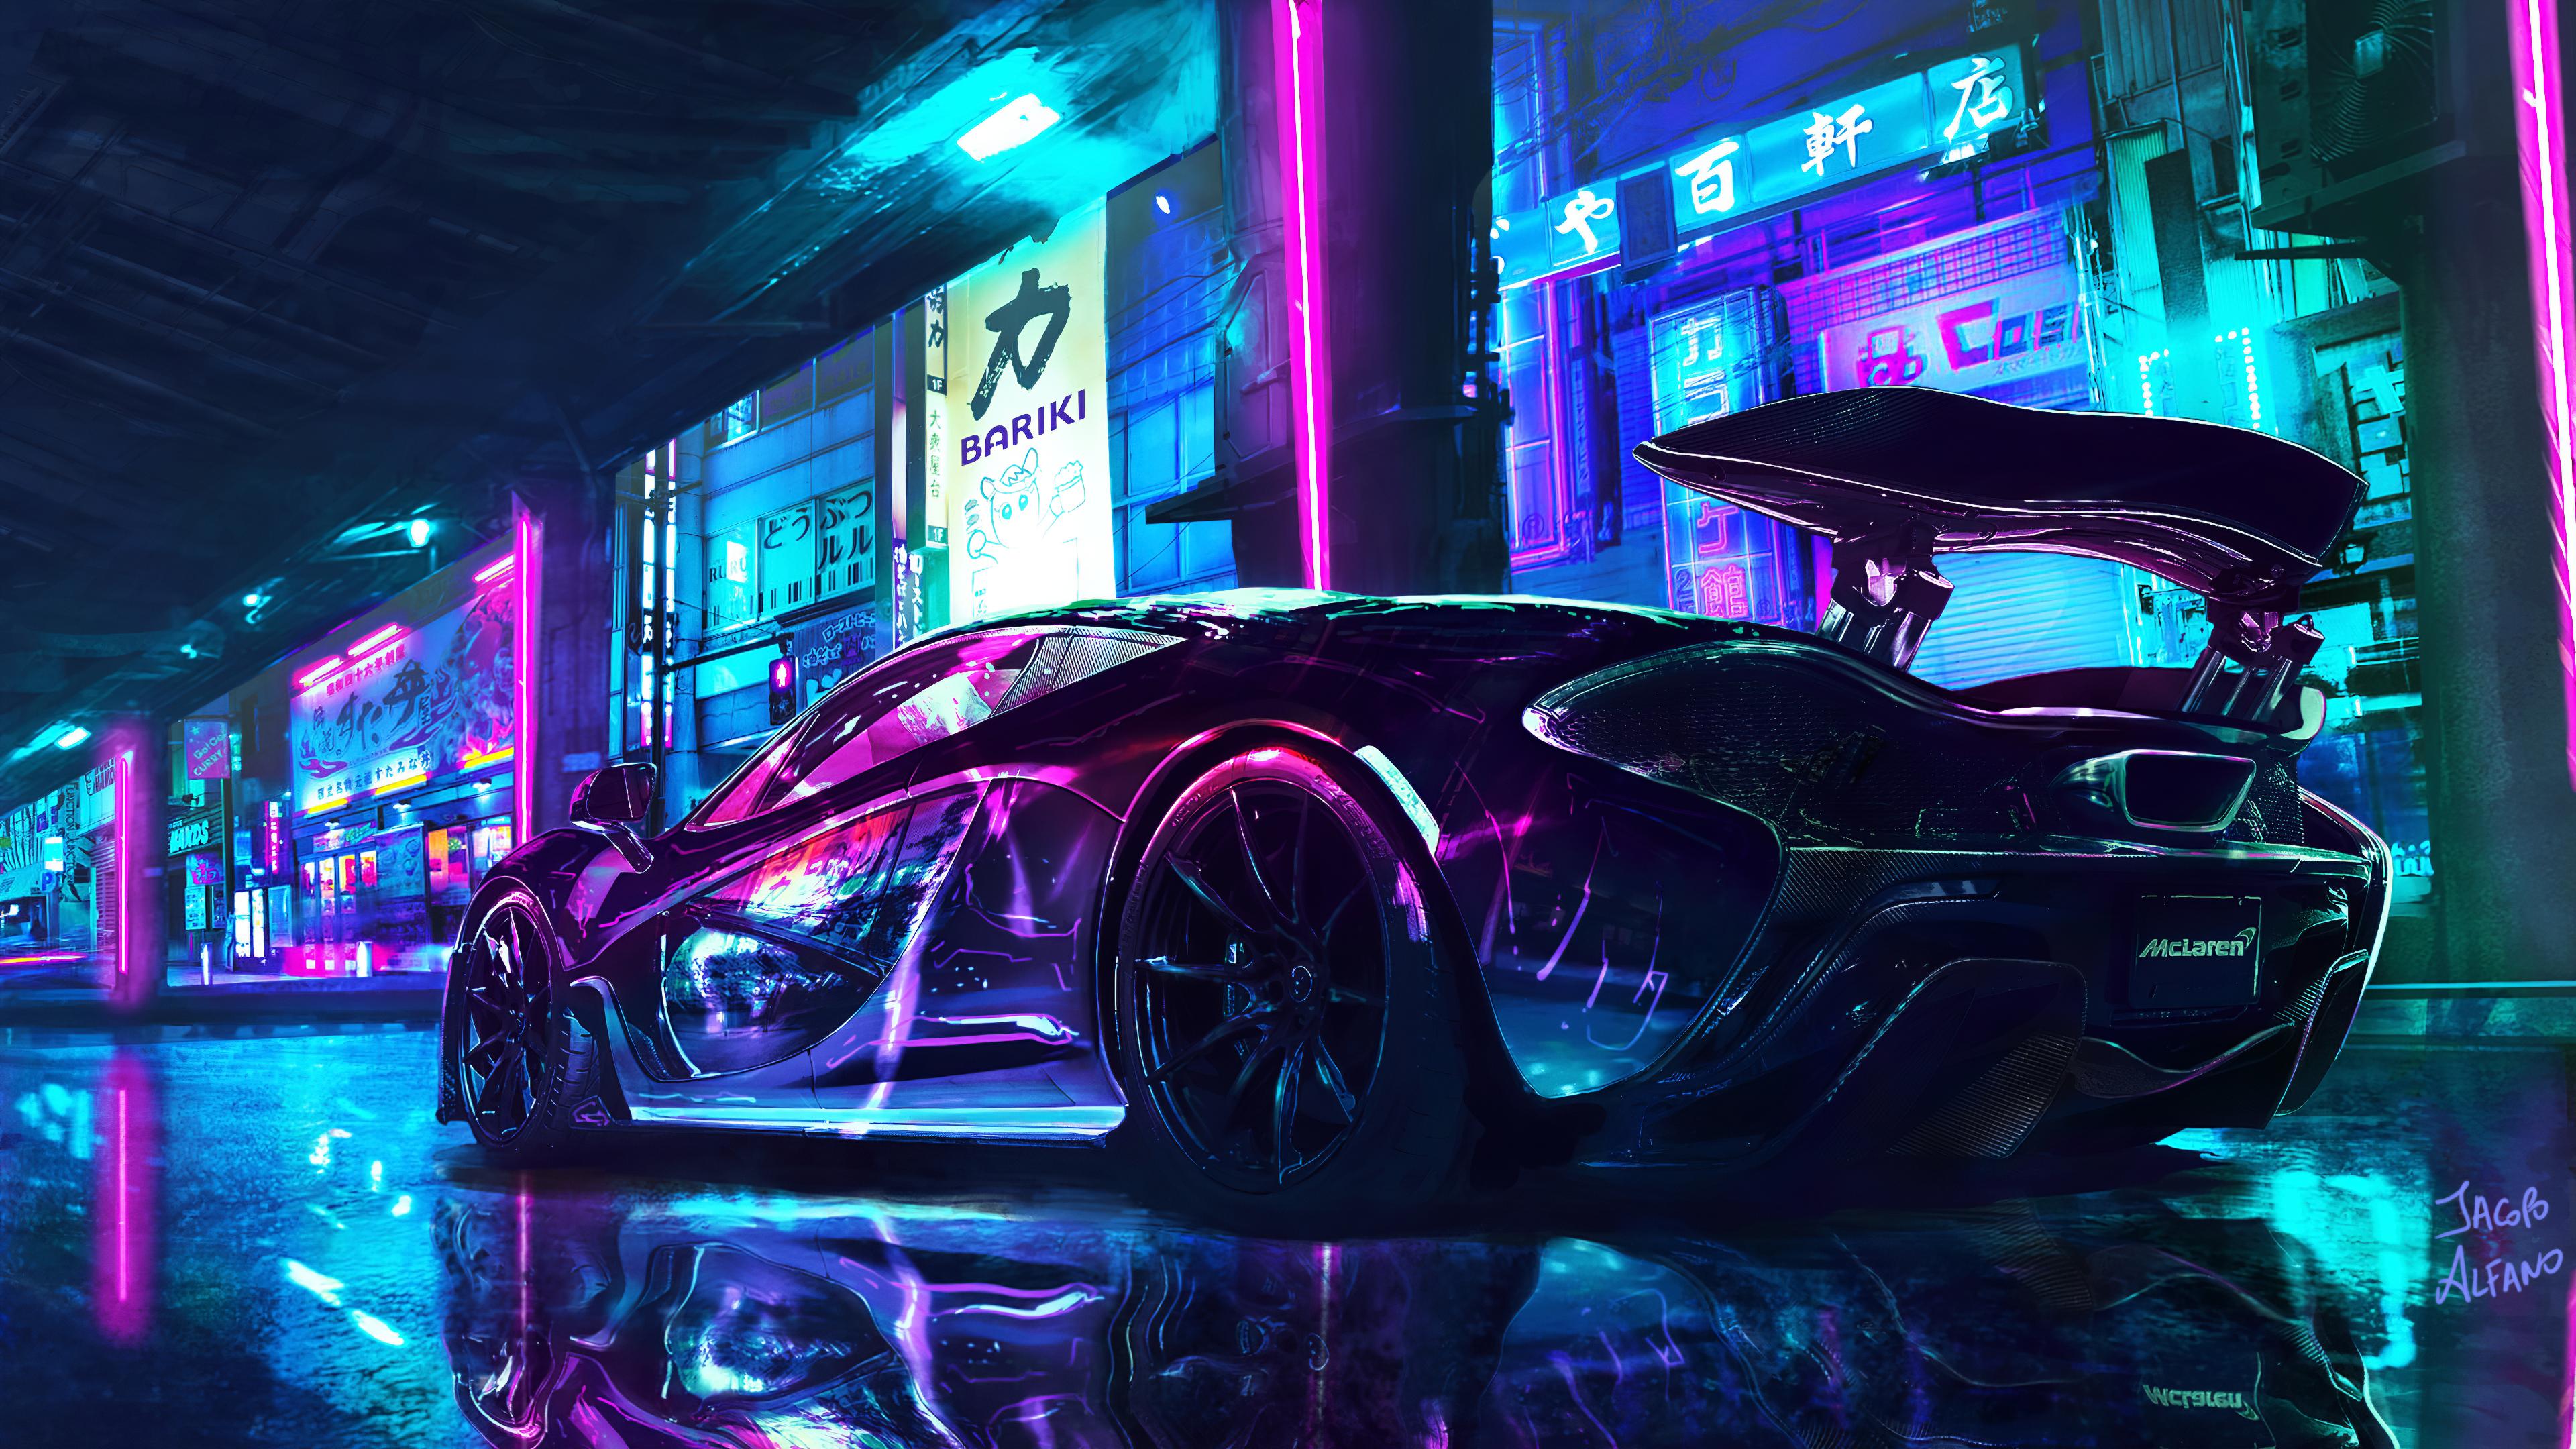 Mclaren Mp4 Cyberpunk Chrome By Jacopo Alfano 3840x2160 3840x2160 Wallpaper Cyberpunk Wallpaper Neon Wallpaper